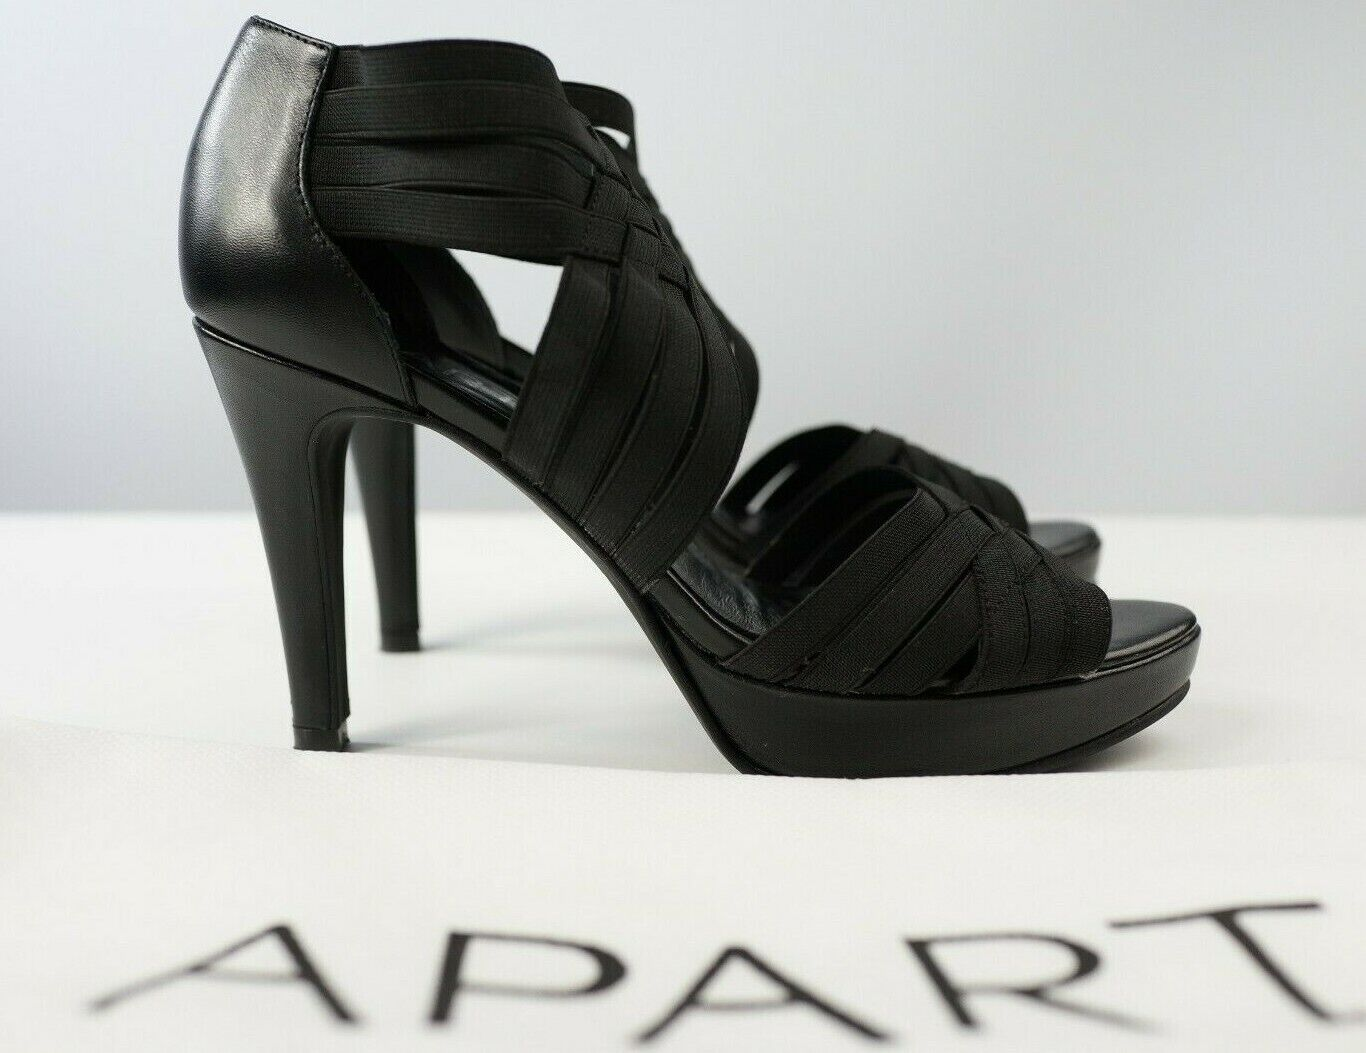 Plateau Leder 37 schwarz Riemenpumps Designer fashion